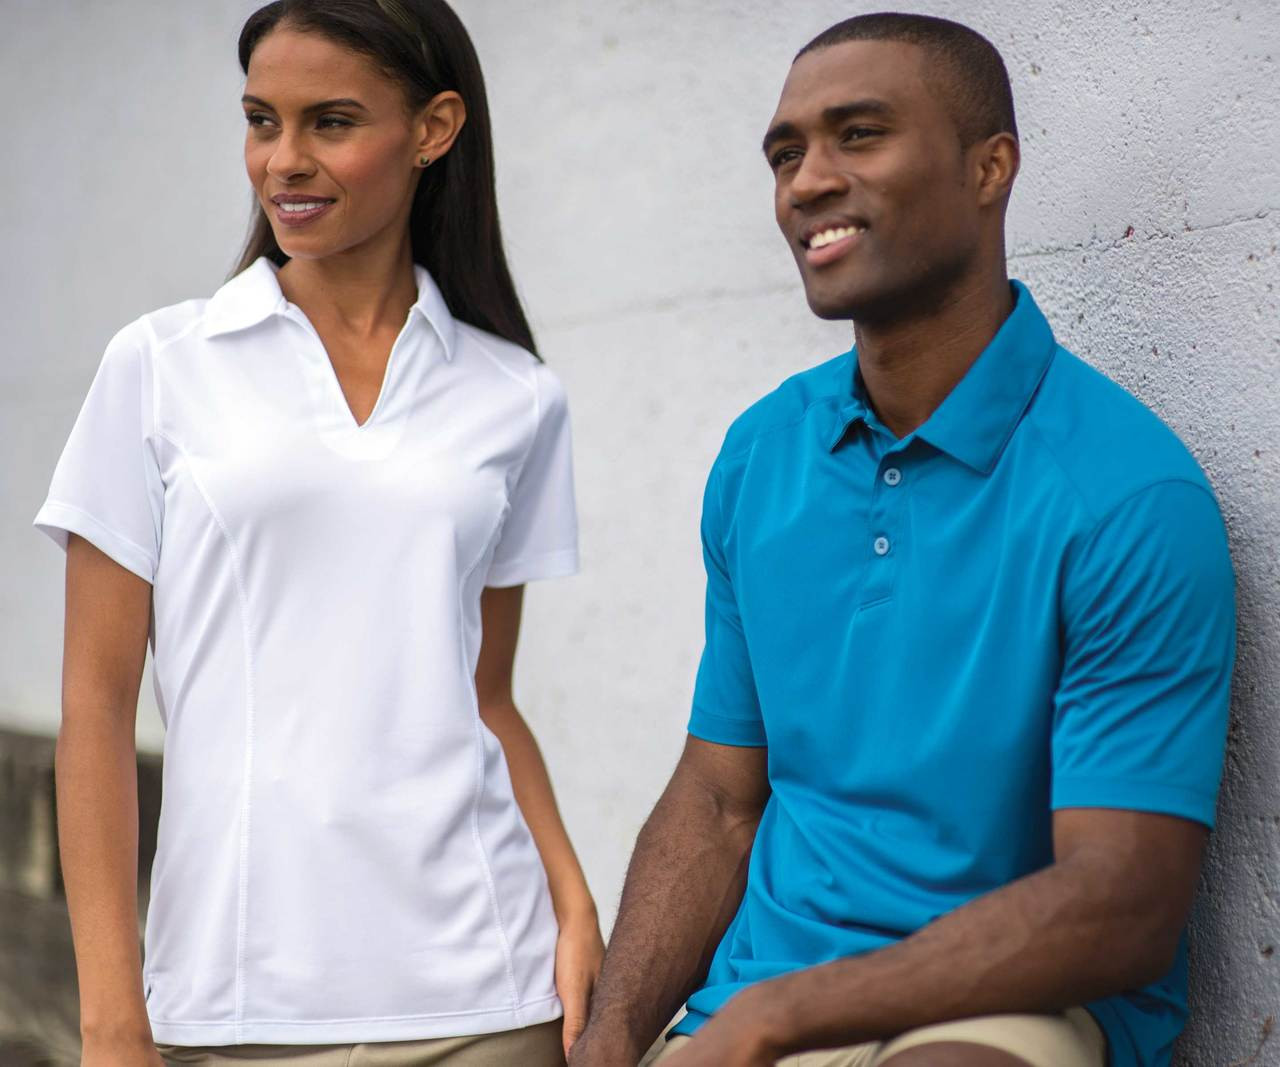 Moisture Wicking Polo Shirt Waitstuff Uniforms